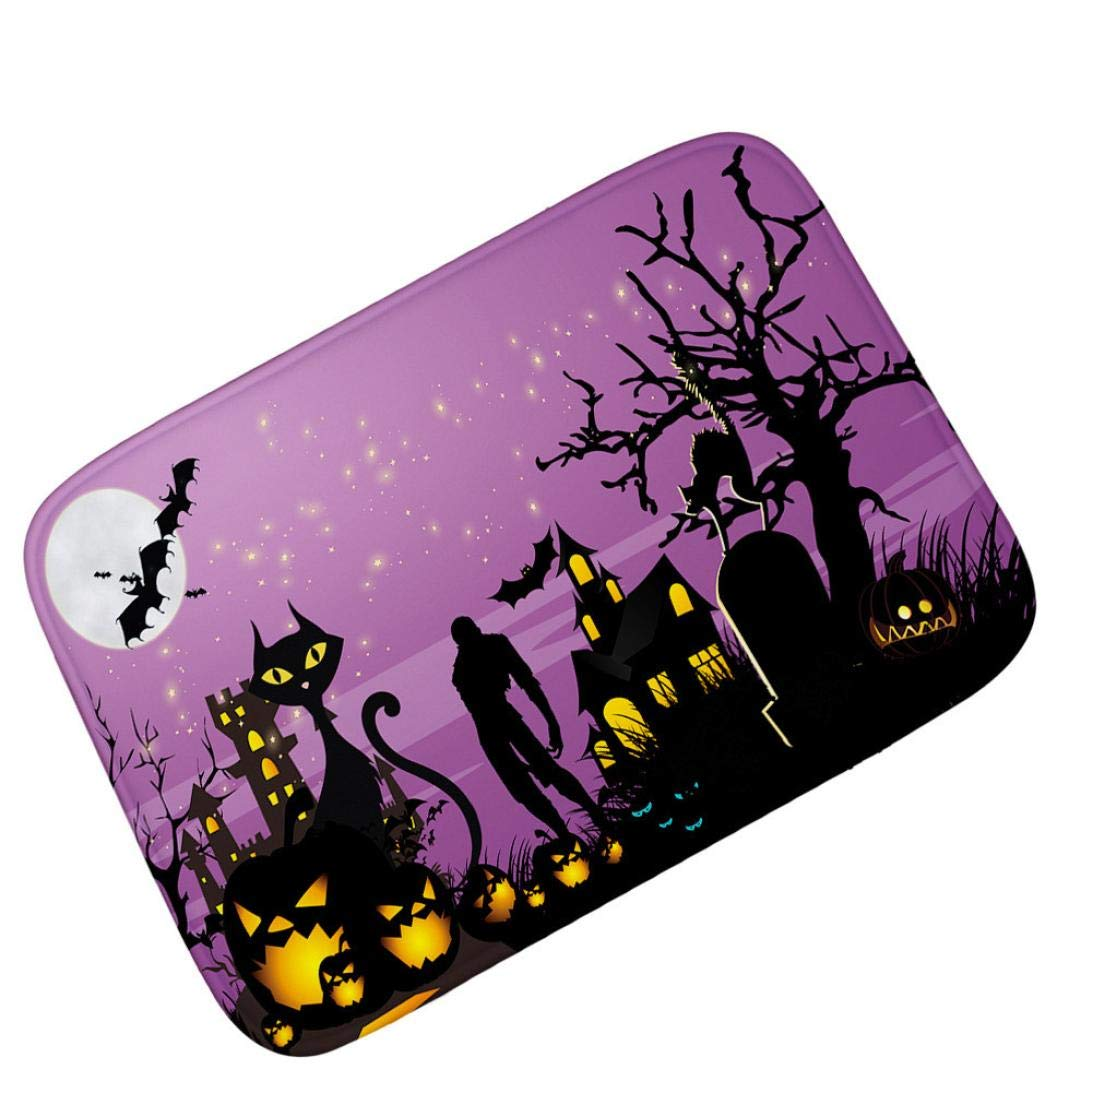 Lovewe Non-slip Carpet,Halloween Decoration,Ghosts Of The Halloween Carpet for Home Office Bedroom Non Slip(40cmX60cm) (C)